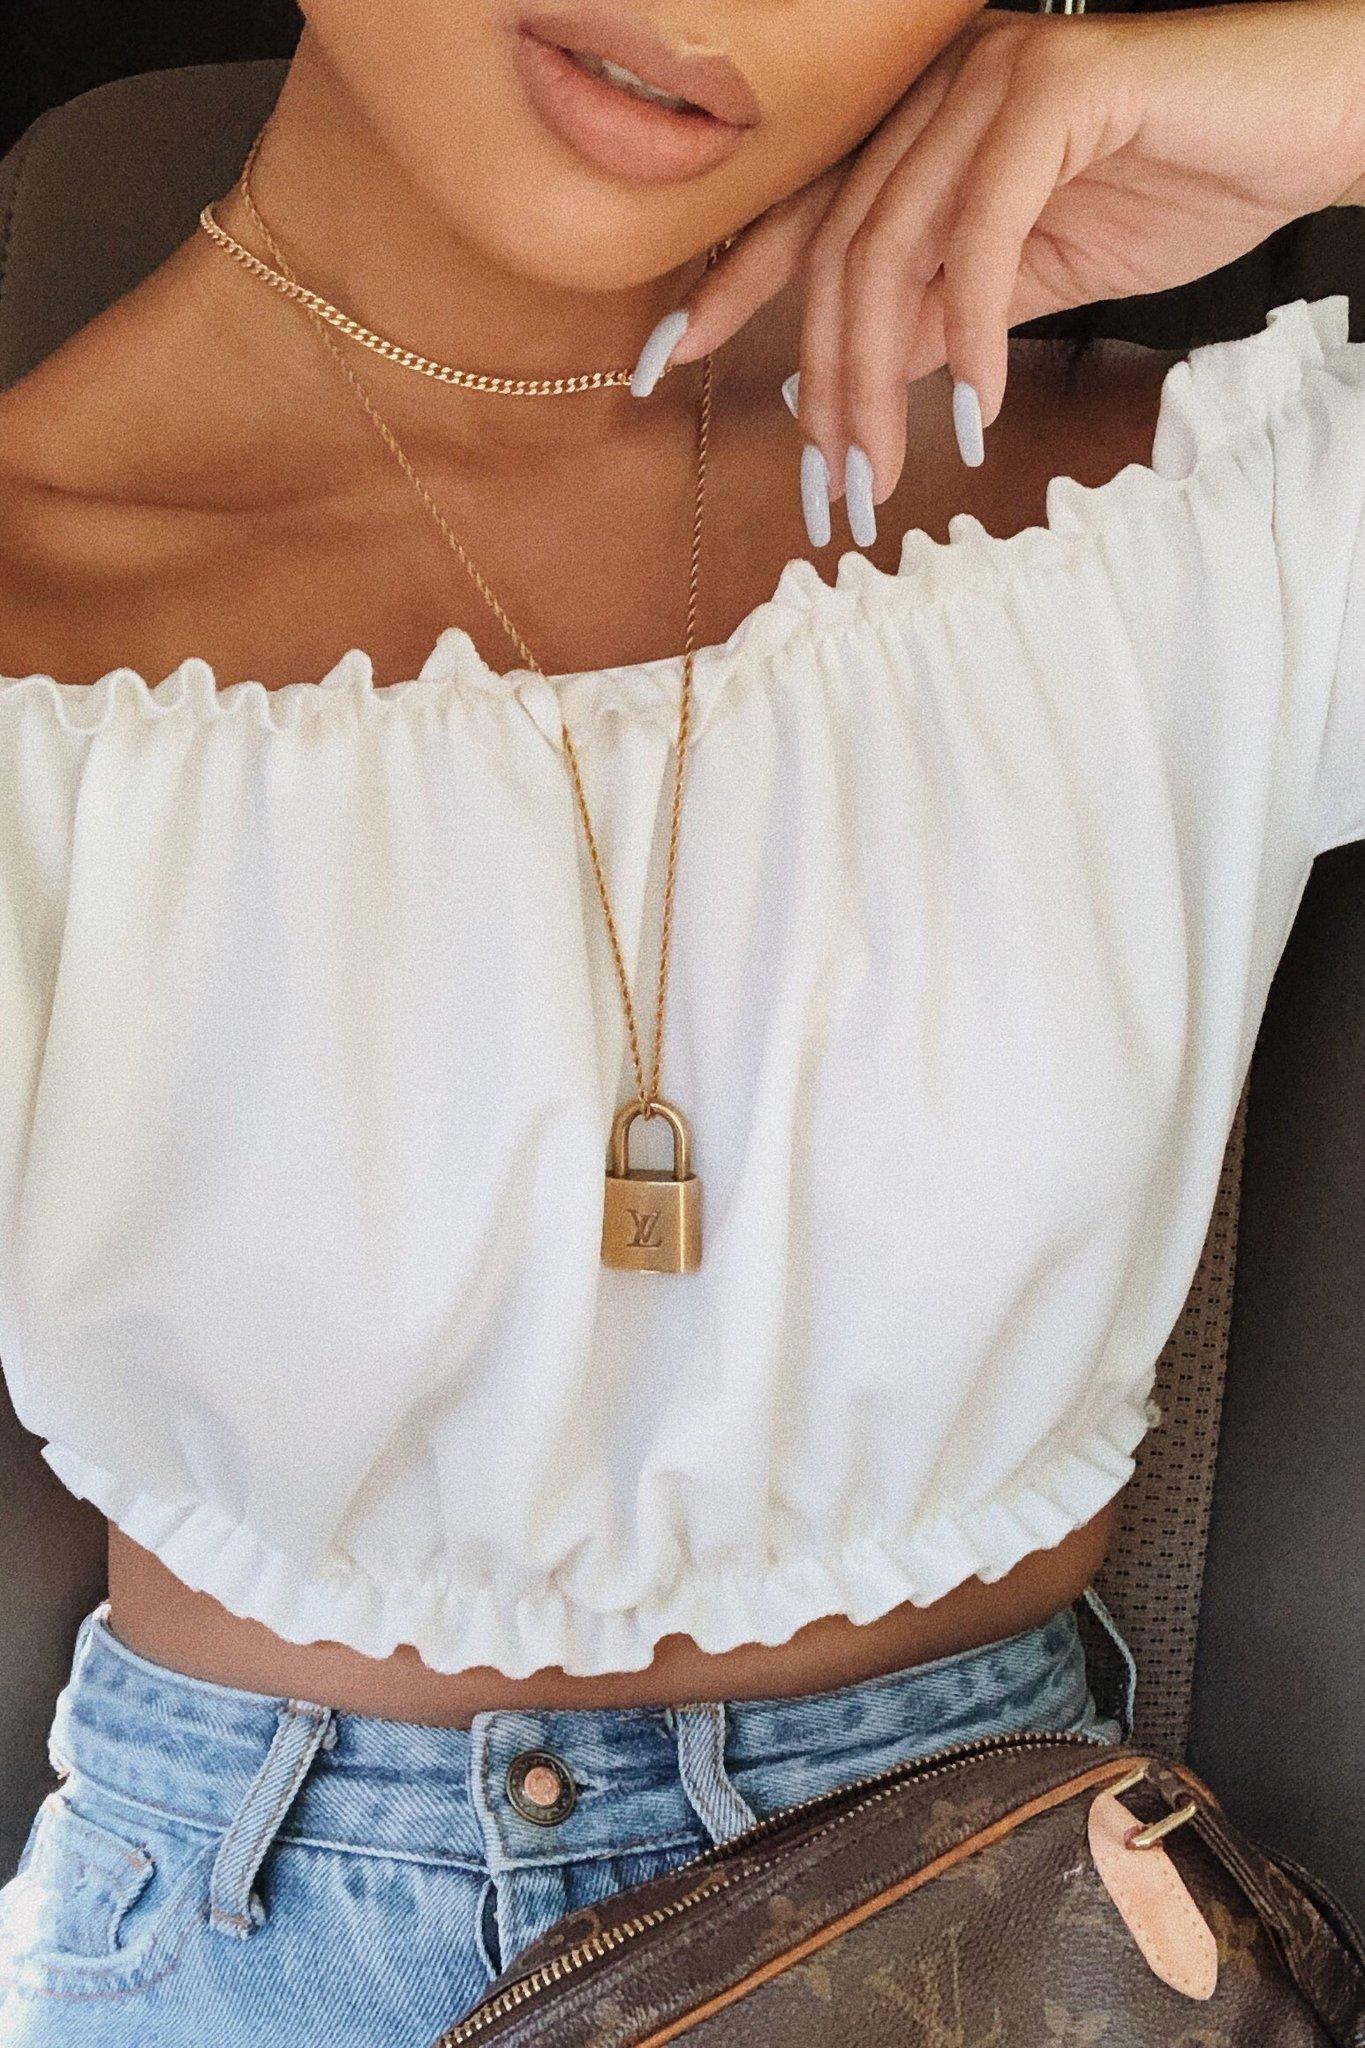 Louis Vuitton Lock Necklace Outfit.jpg